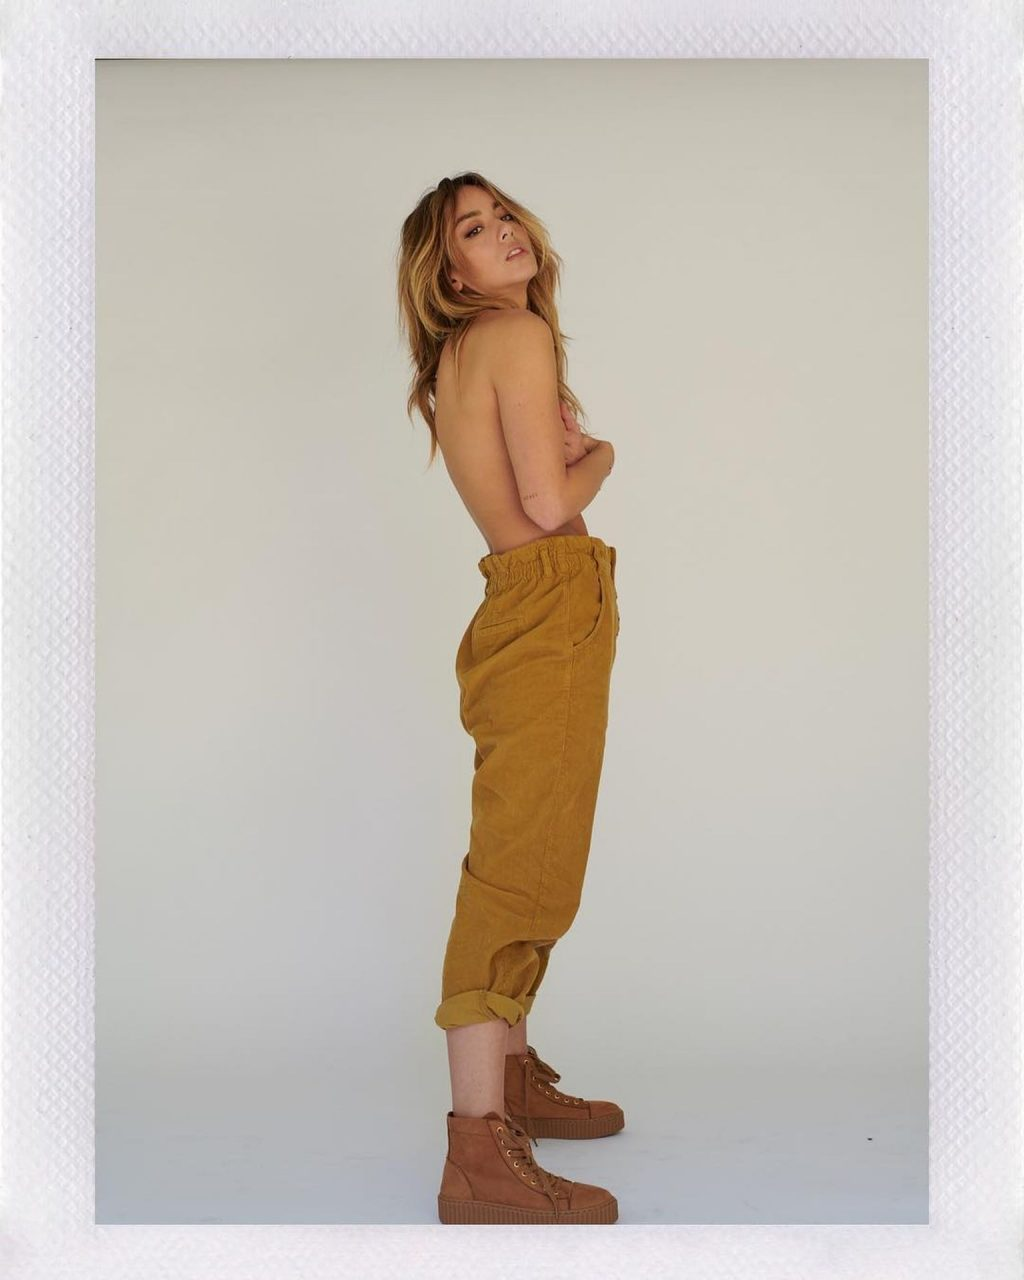 Chloe Bennet Sexy (8 Photos)